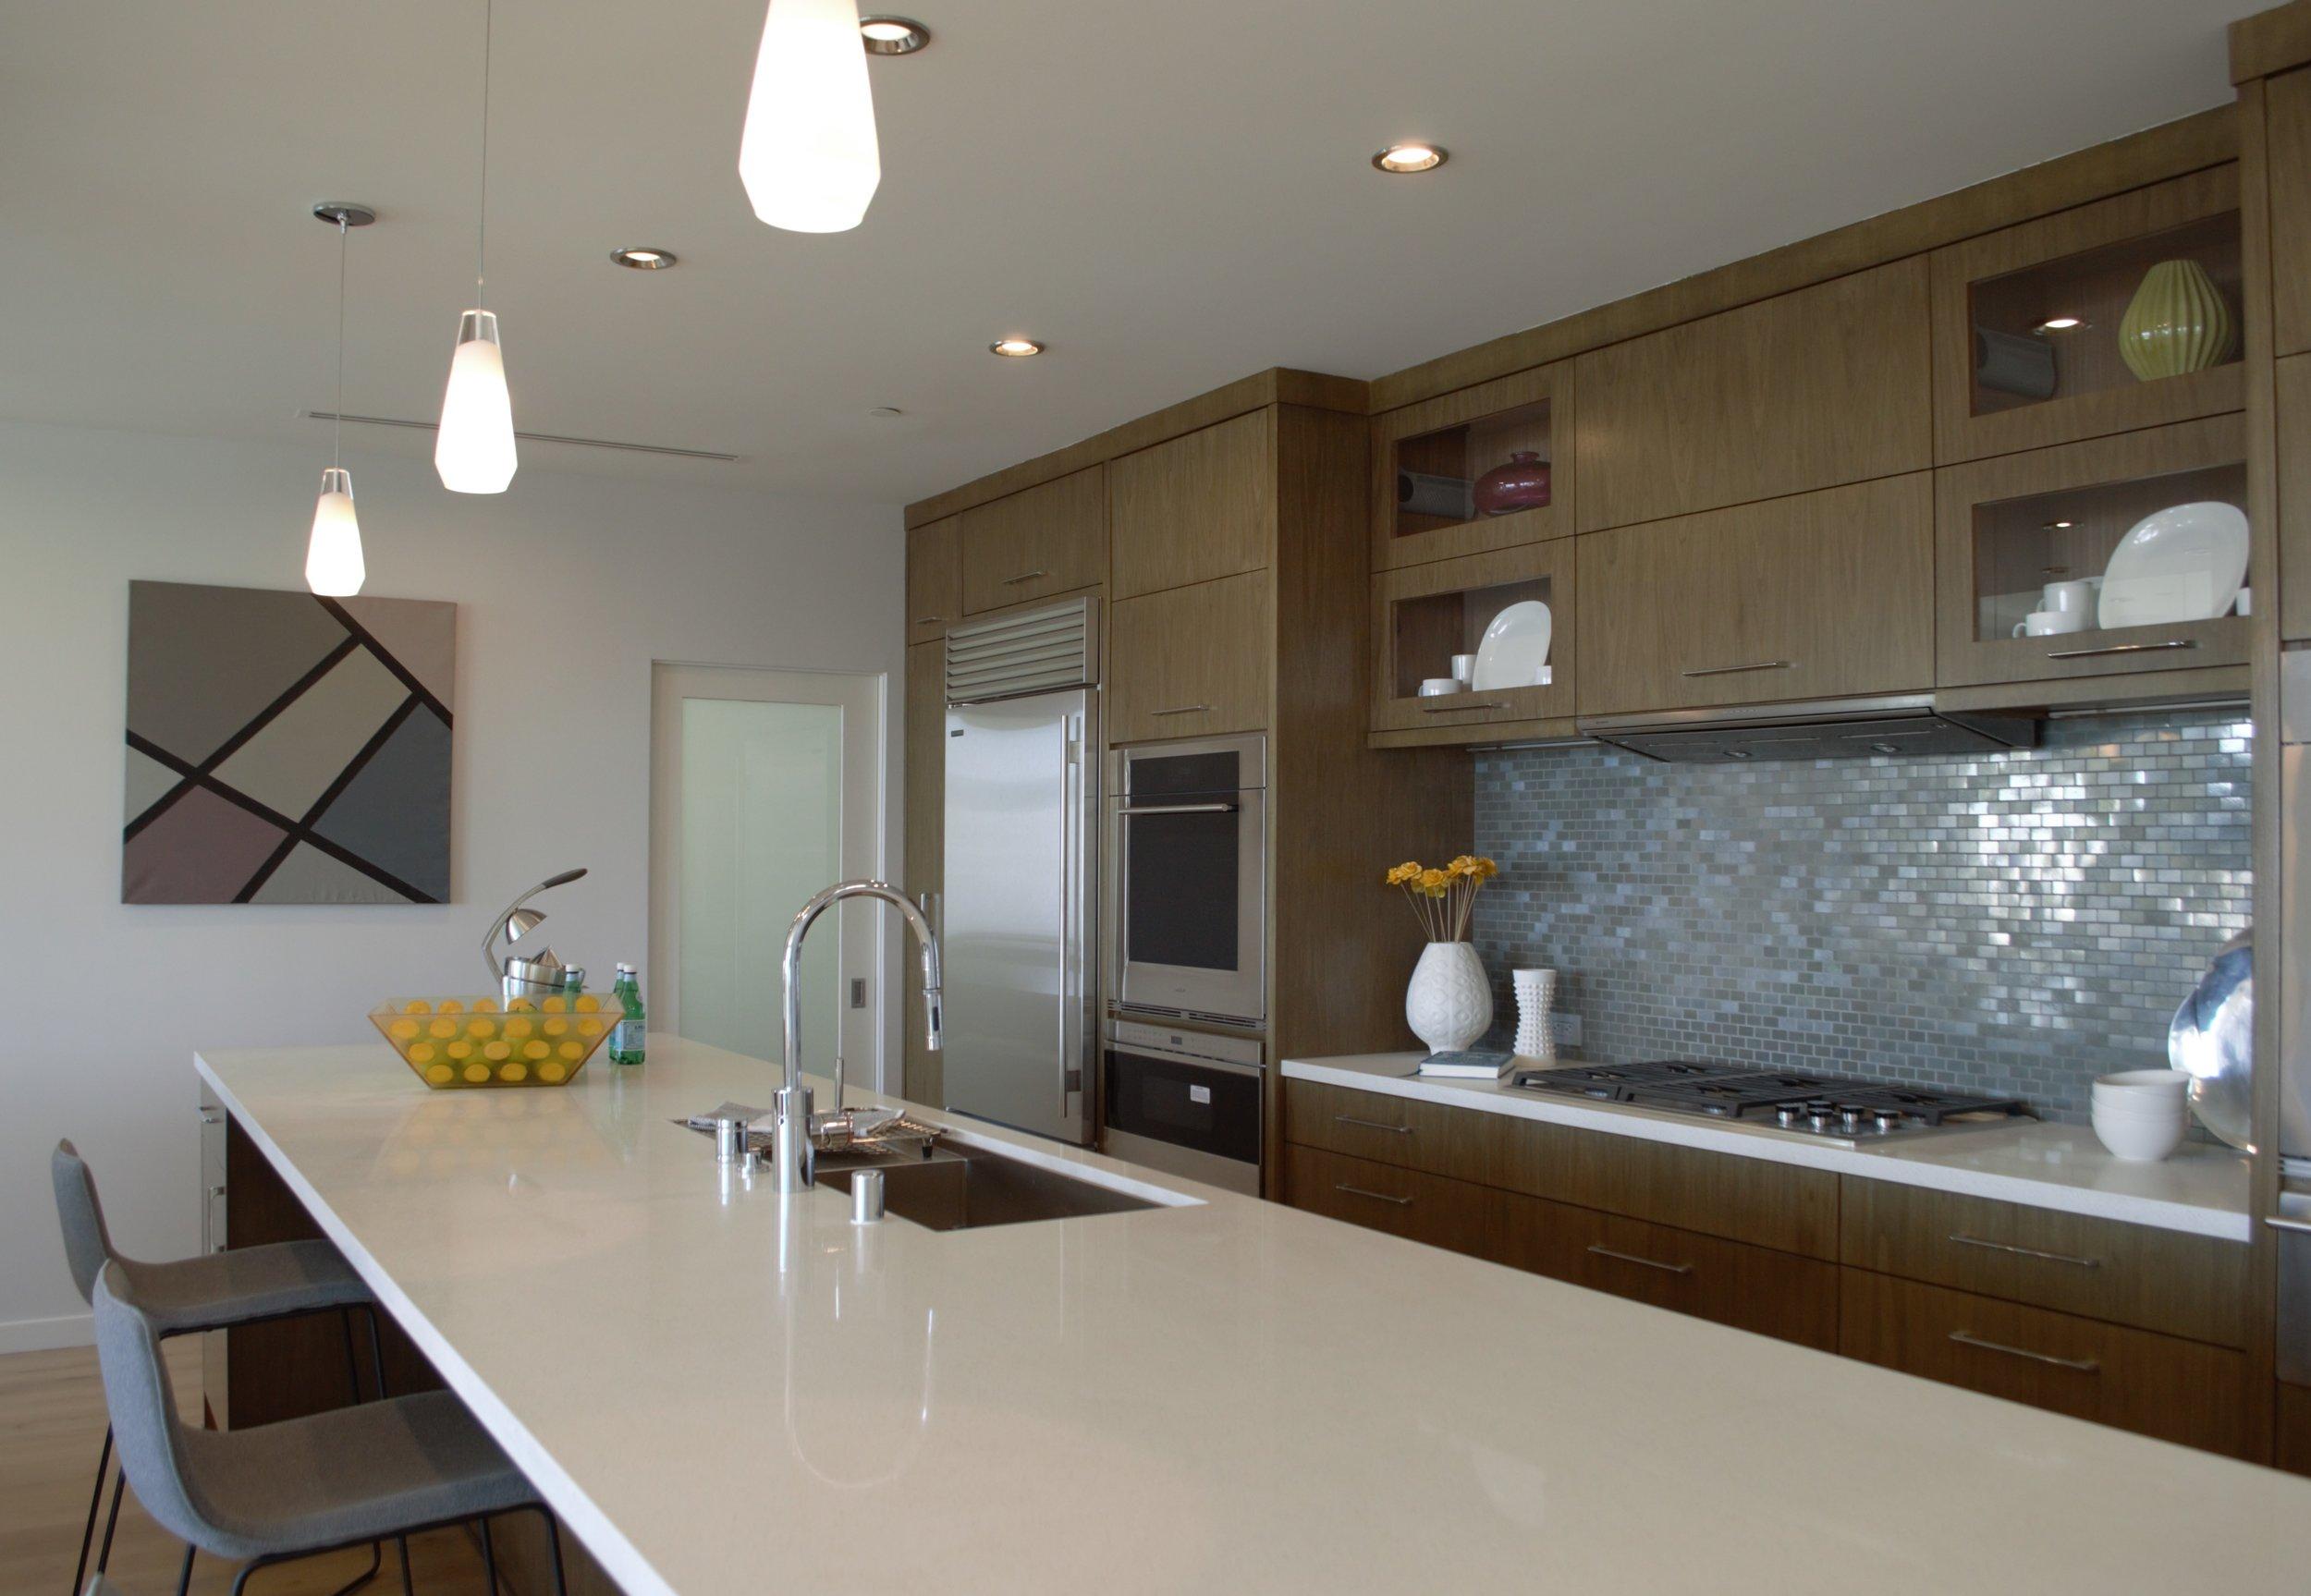 kitchen design, walnut cabinetry, quartz counters, artwork, waterstone faucet, interior design, modern, midcentury, daltile, stainless steel, y-lighting